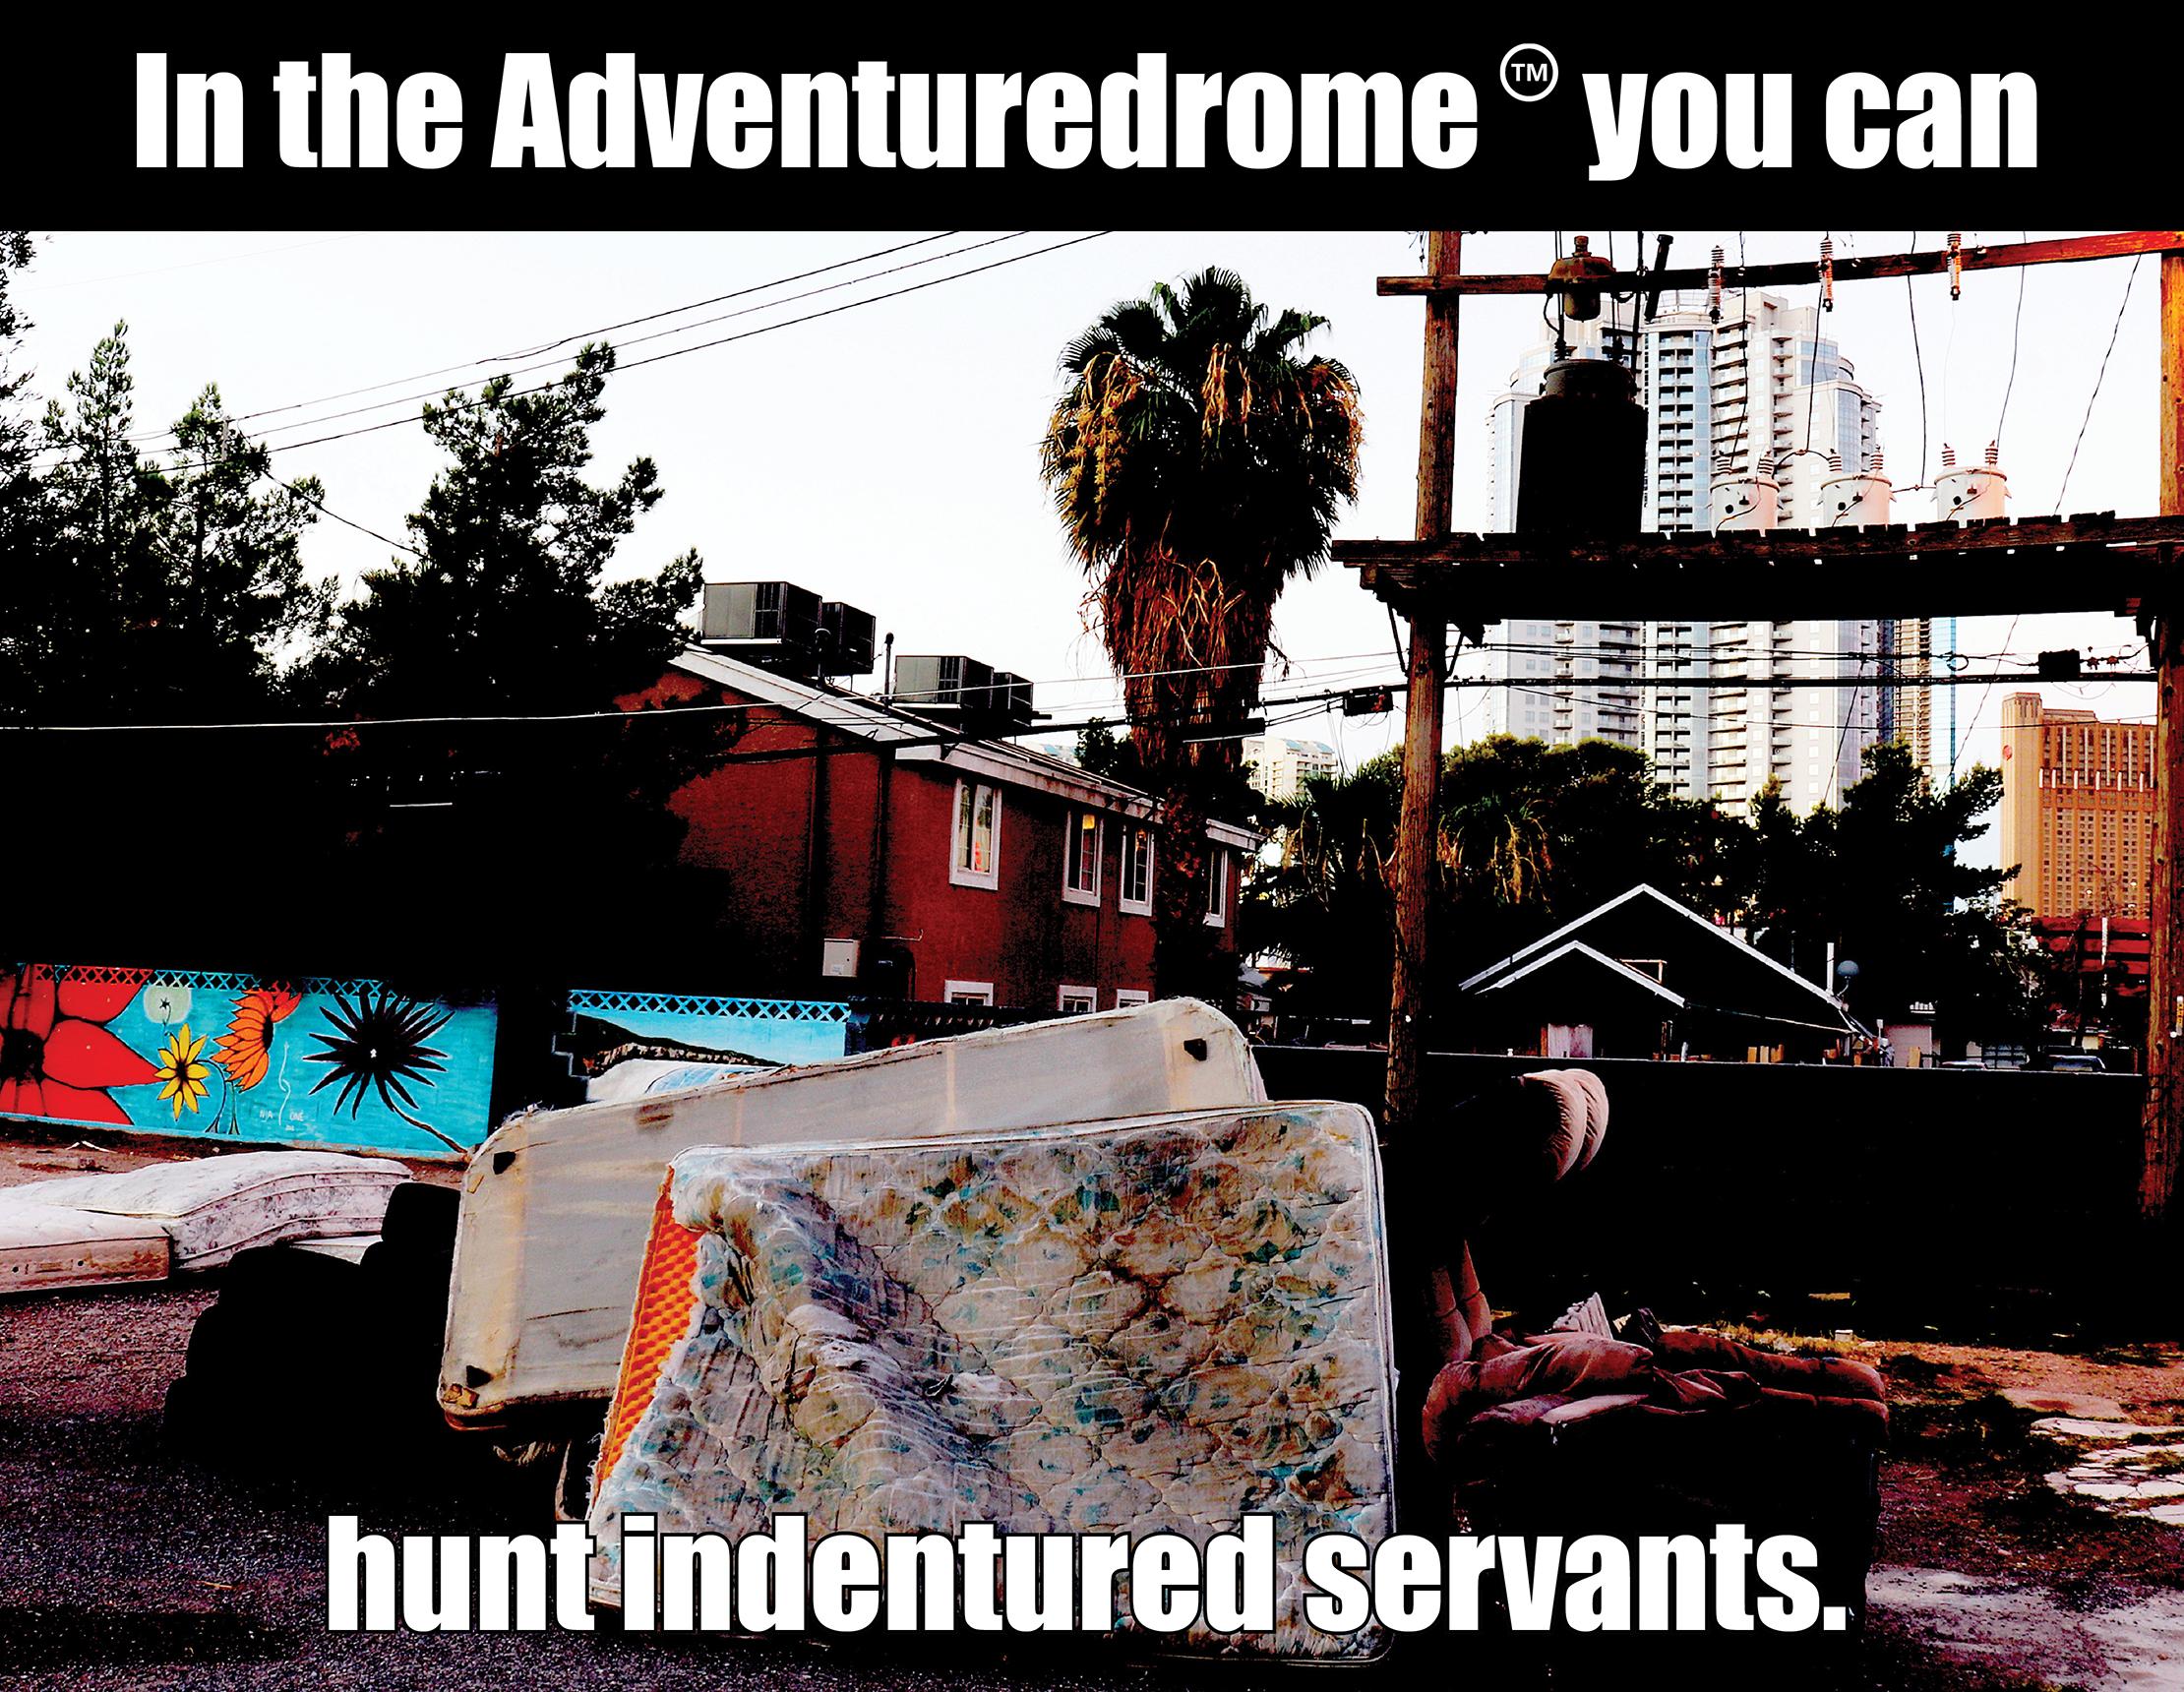 adventuredrome2memeform.jpg